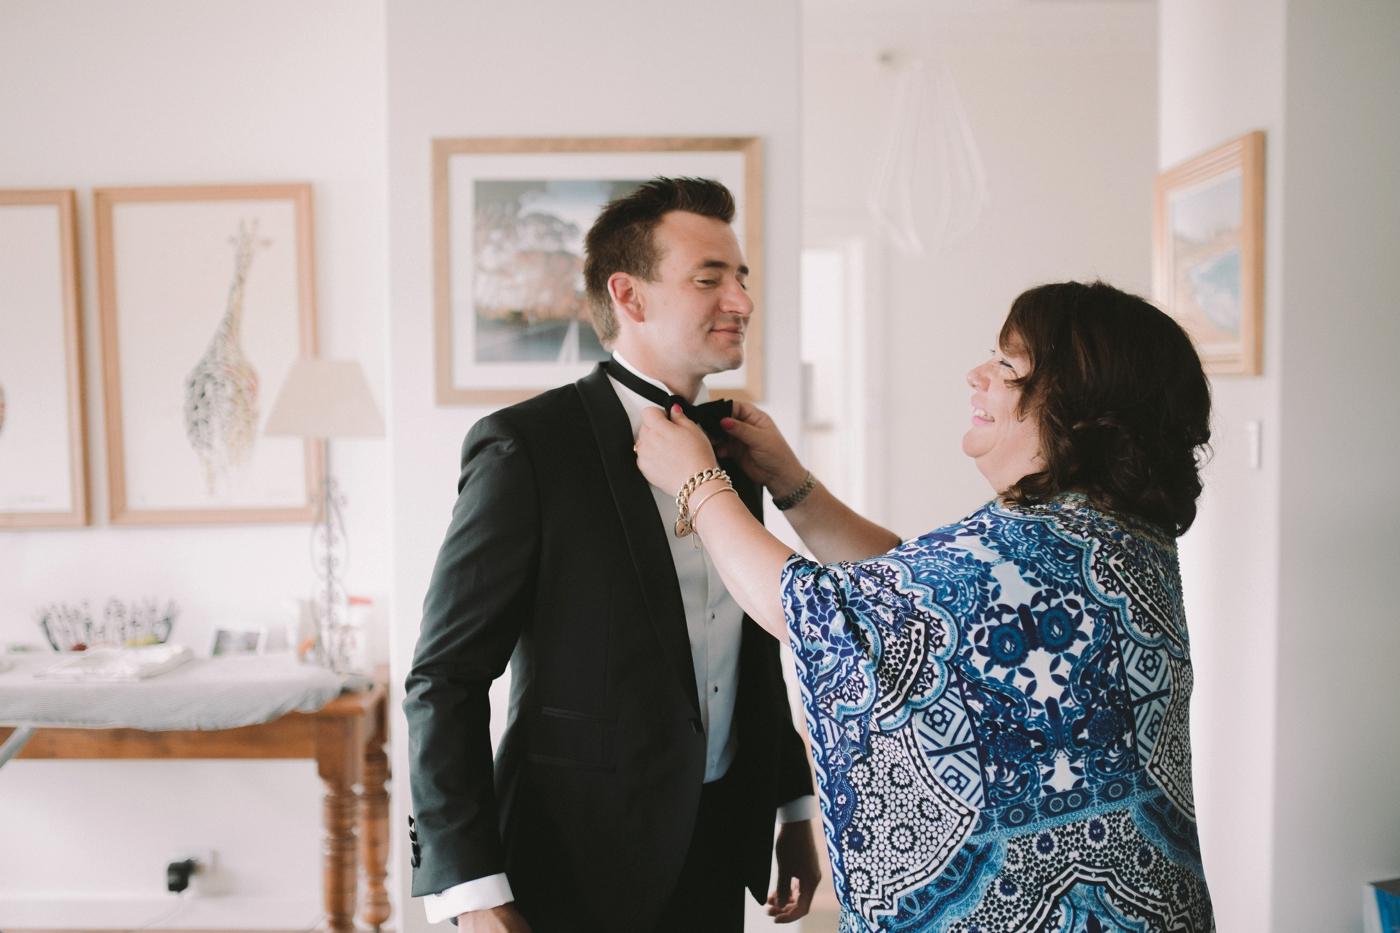 Bec & Brad - Waverley Estate Wedding - Natural Wedding Photographer in Adelaide - www.katherineschultzphotography.com 22